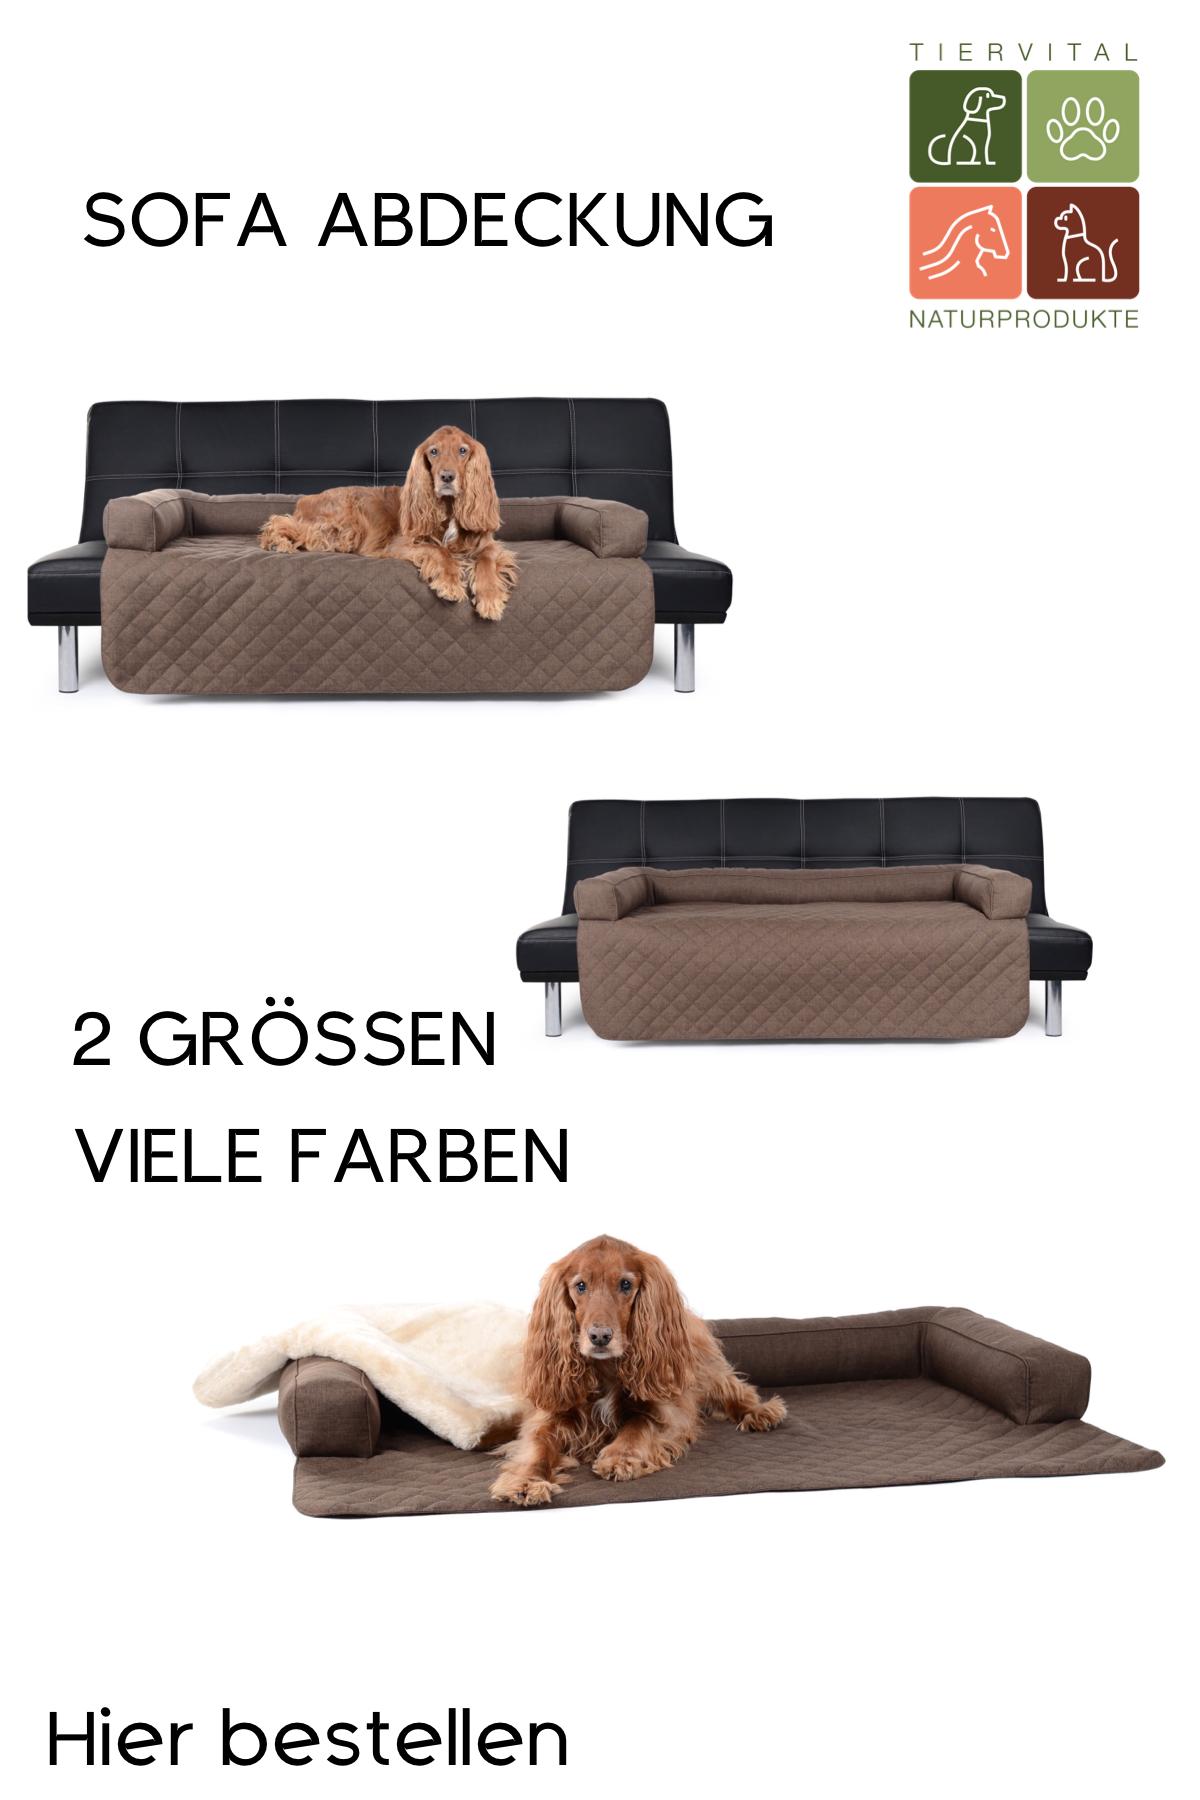 Hund Stuhl Abdeckung Sofaschutz Sofaabdeckung Abdeckung Diyforpets Stuhl In 2020 Hunde Kissen Hundekissen Hund Sofa